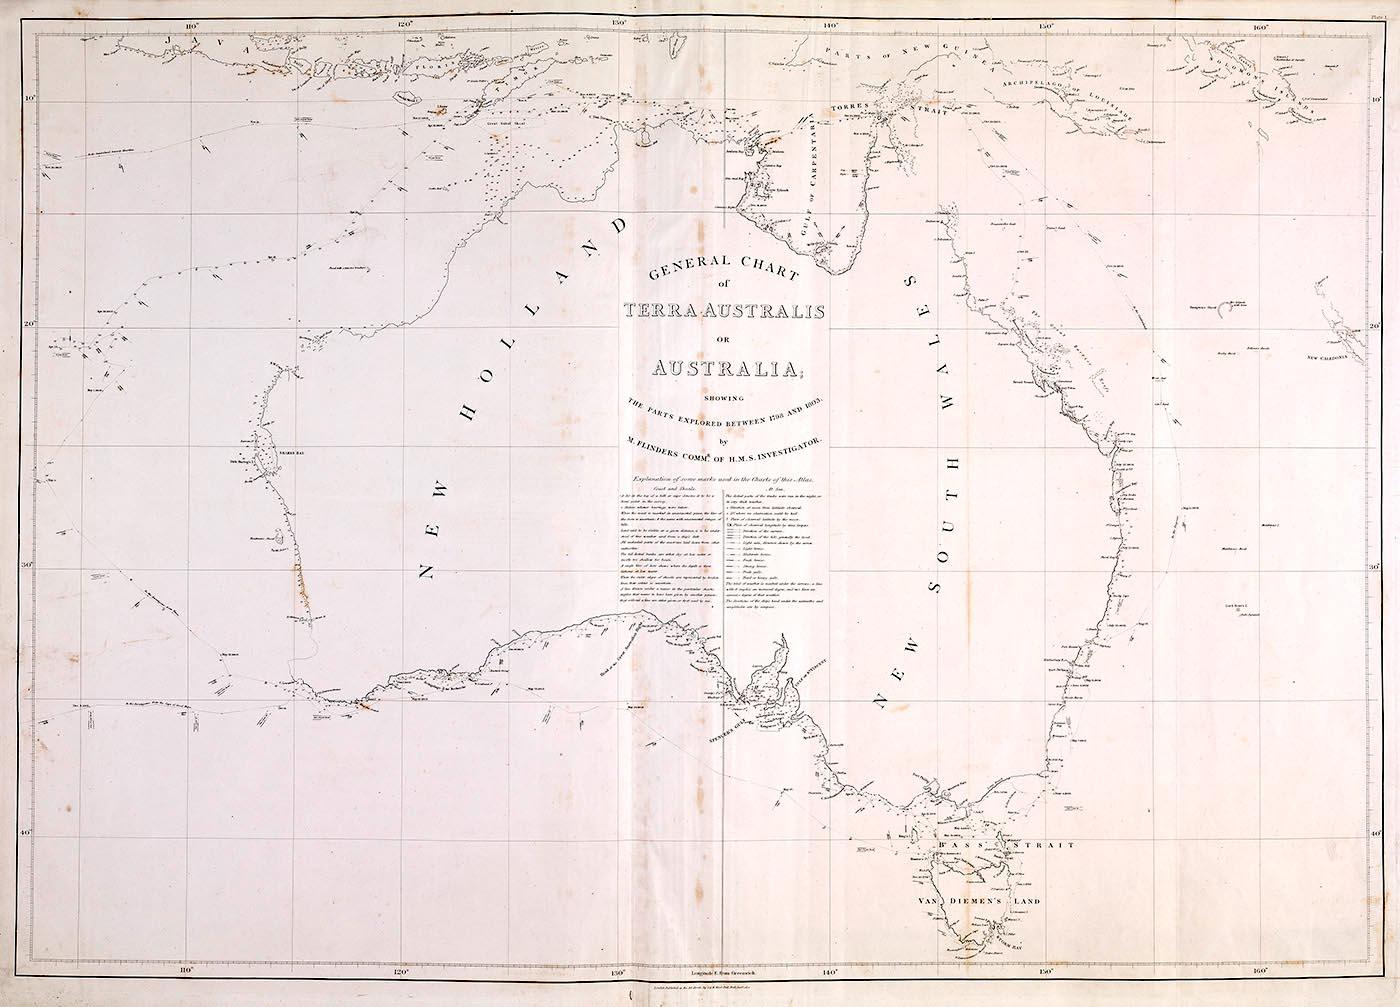 Hand-drawn map of Australia